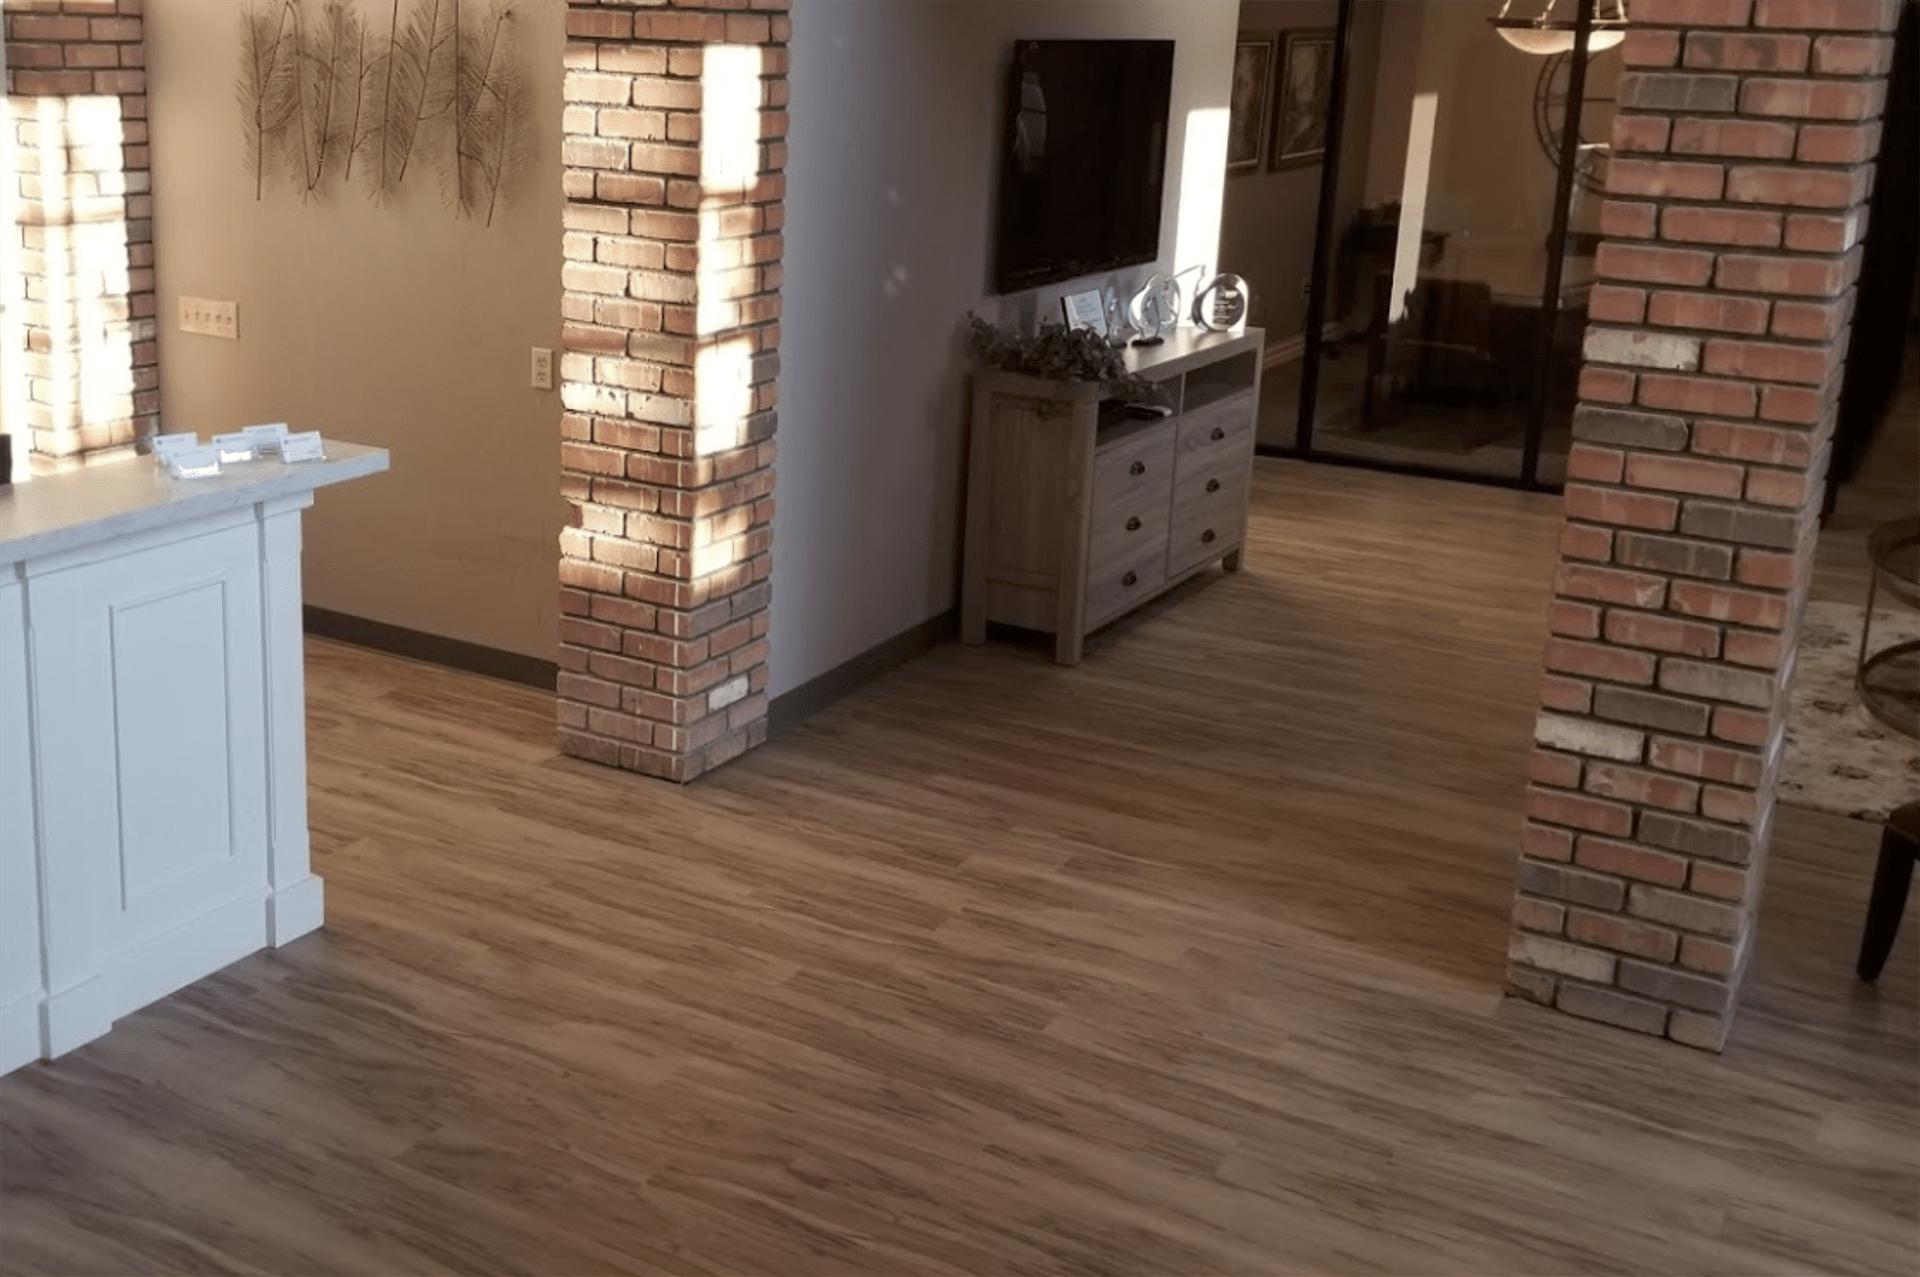 Hardwood flooring from Taylors Flooring in Phoenix, AZ